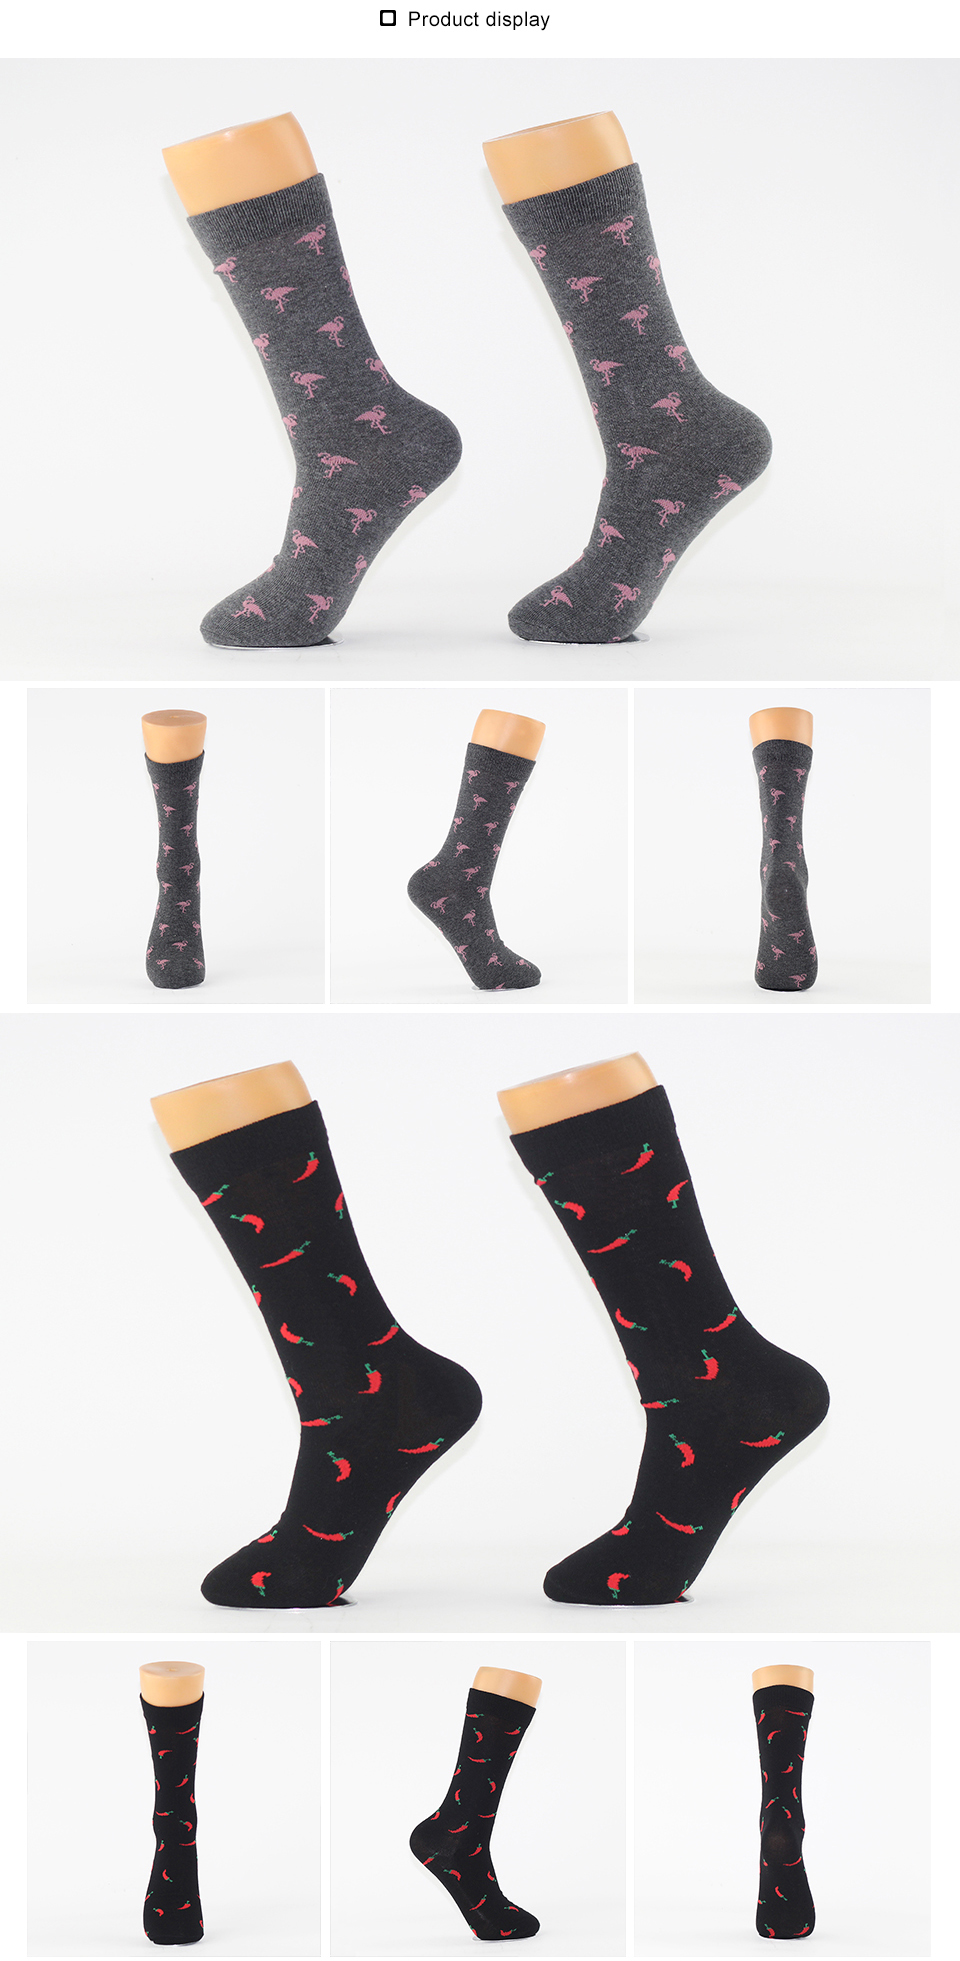 Male Socks